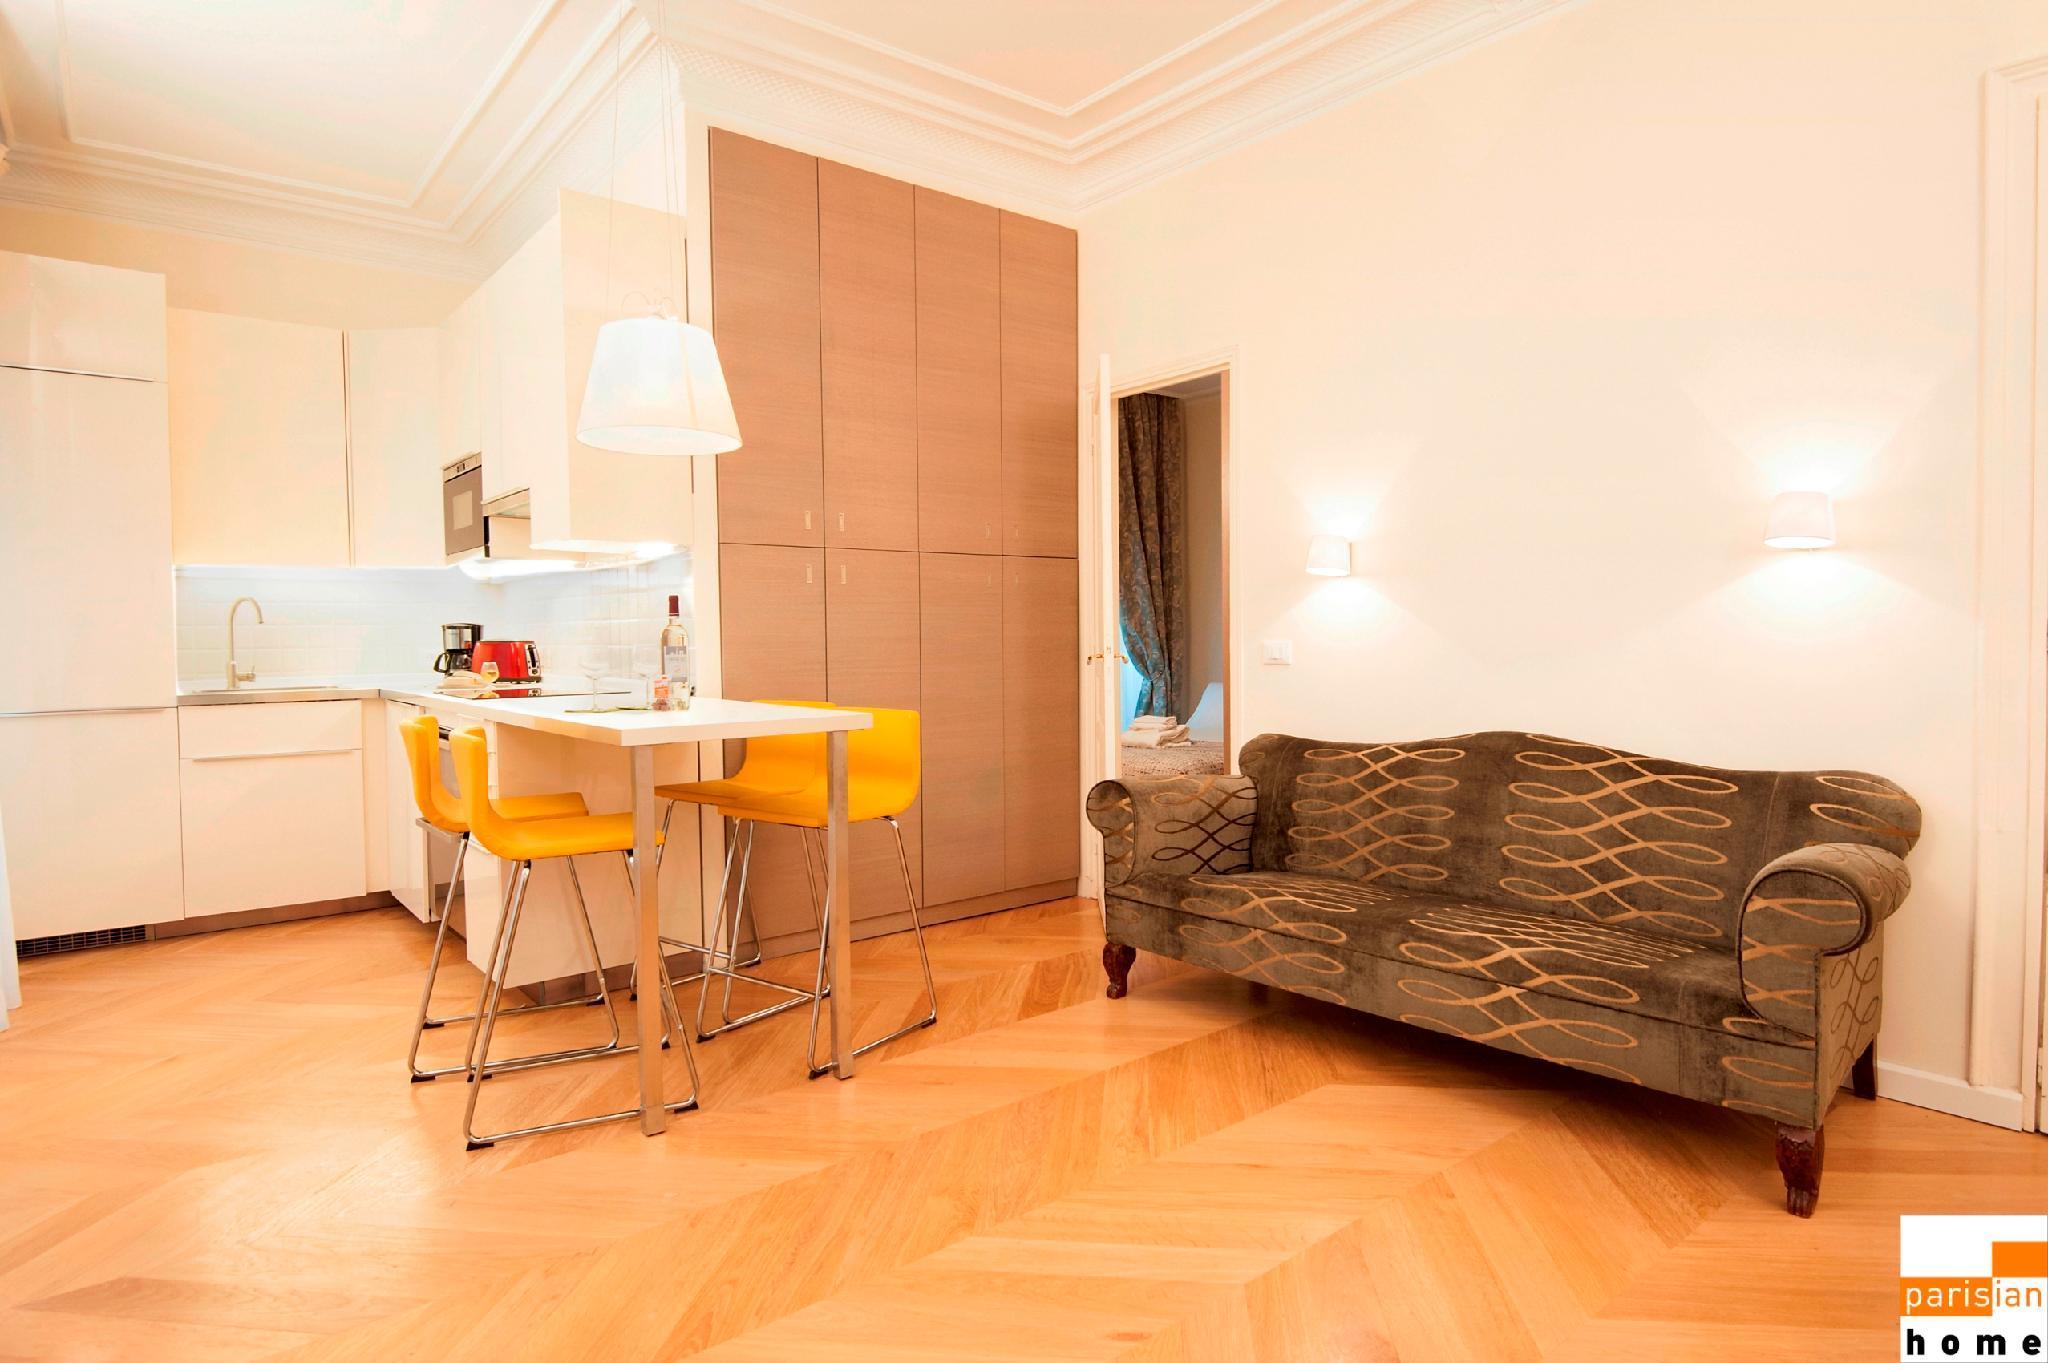 208014 - A prestigious 2-bedroom apartment, very close to the Champs Elysées